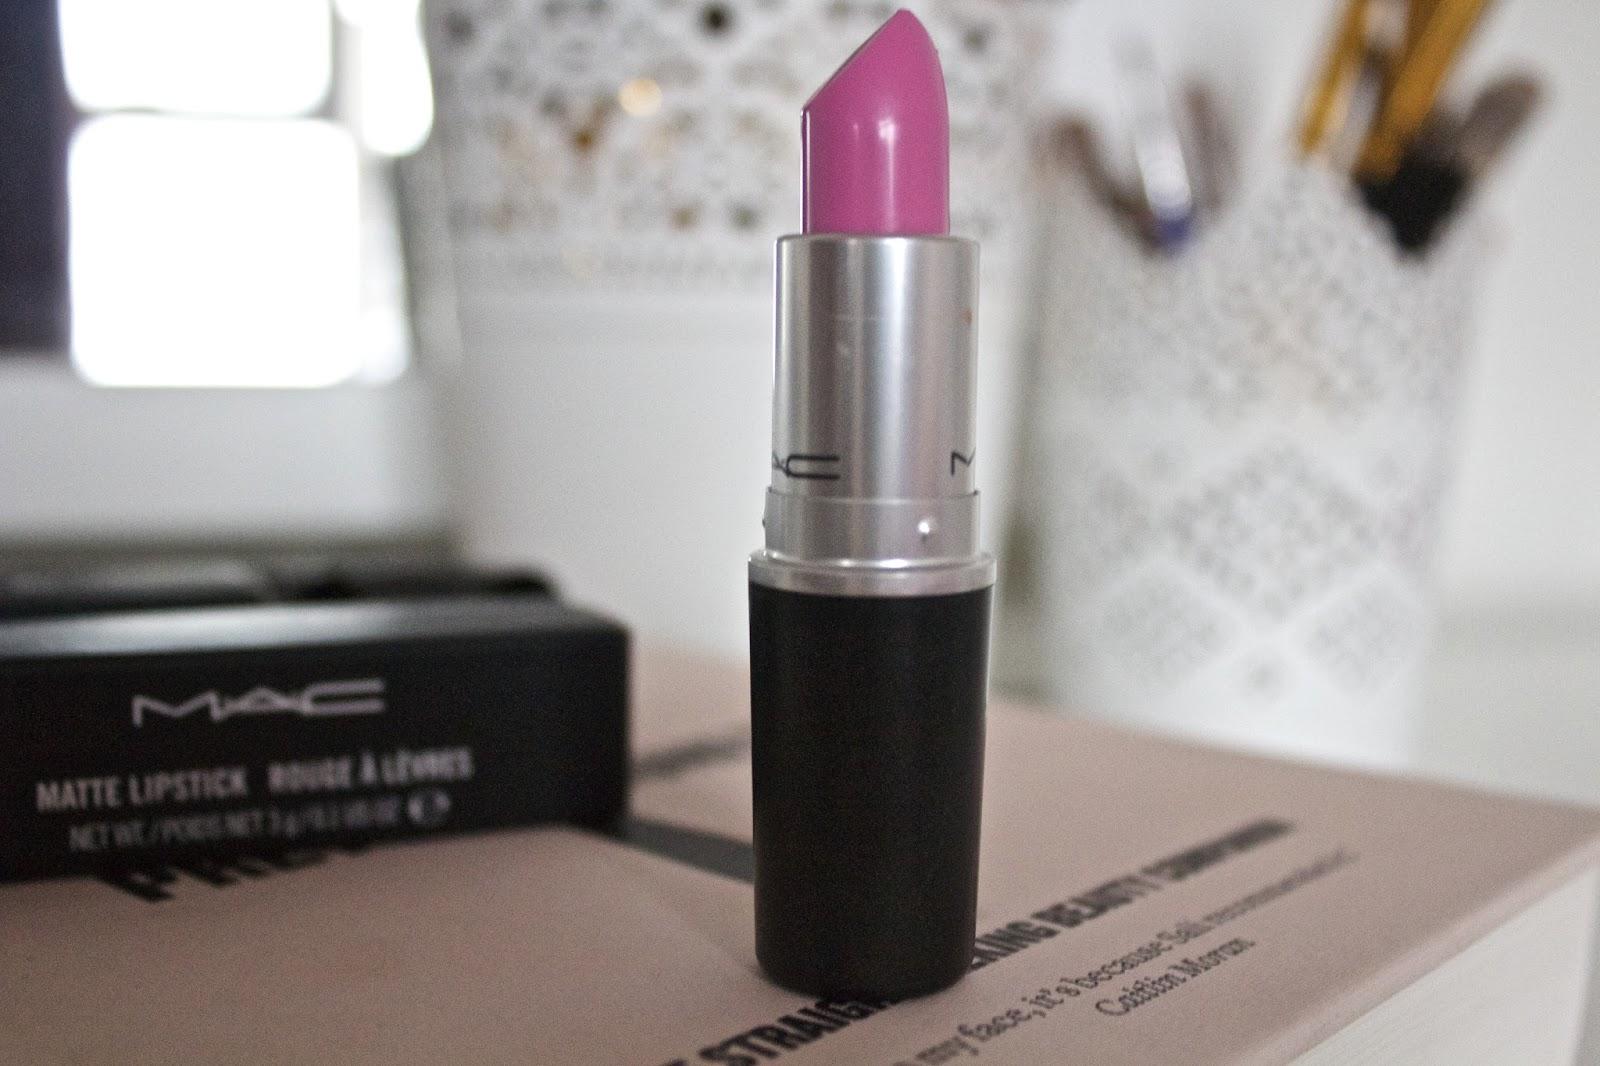 A review of MAC lipstick Saint Germain